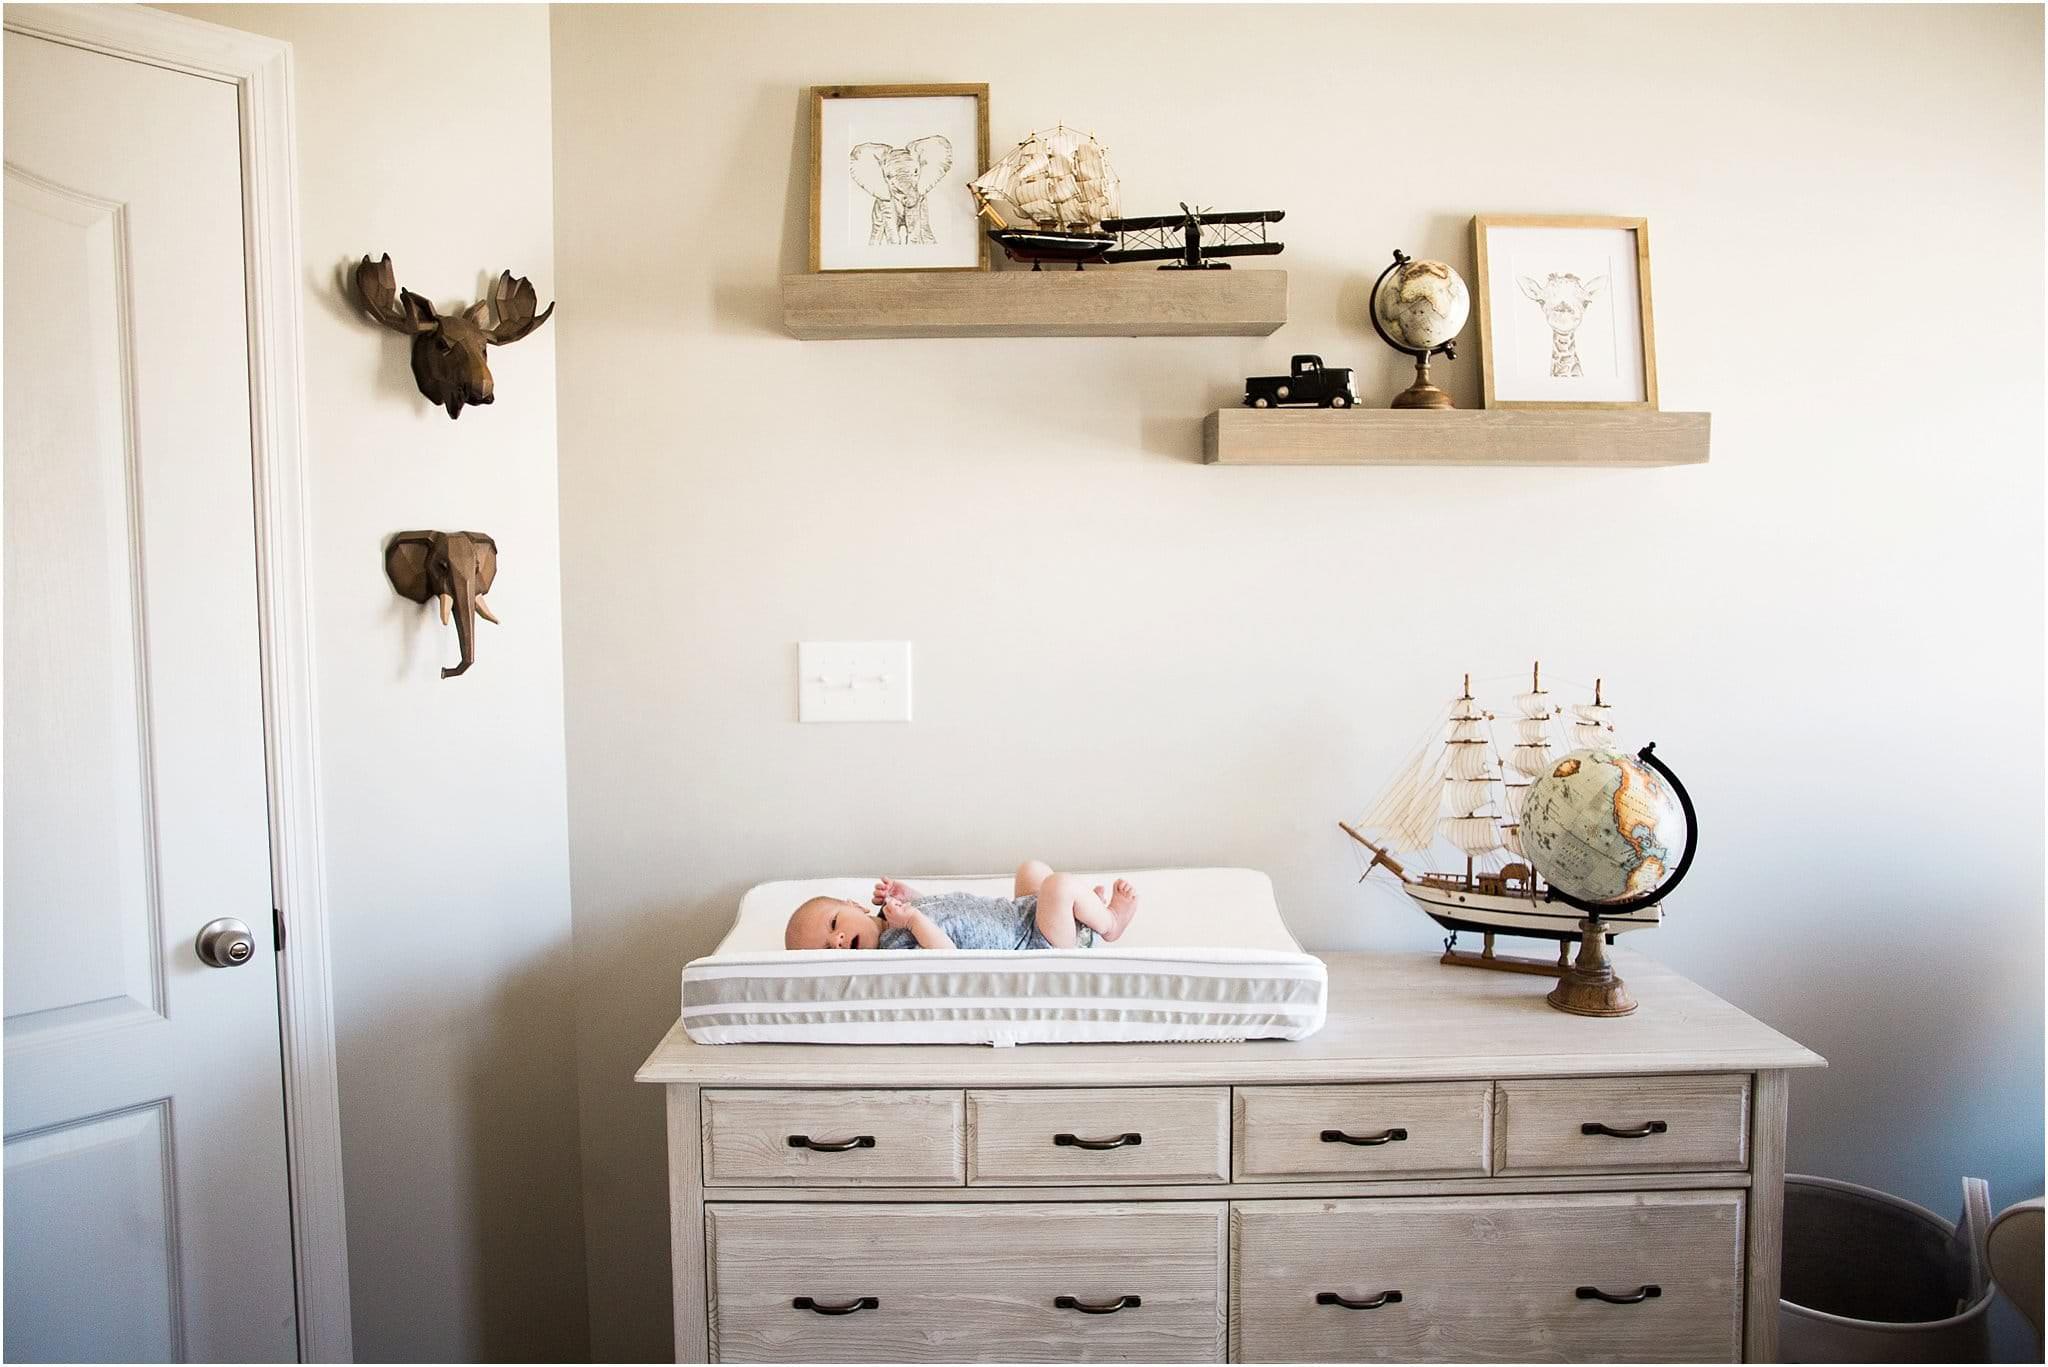 newborn boy in nursery with world travel decor